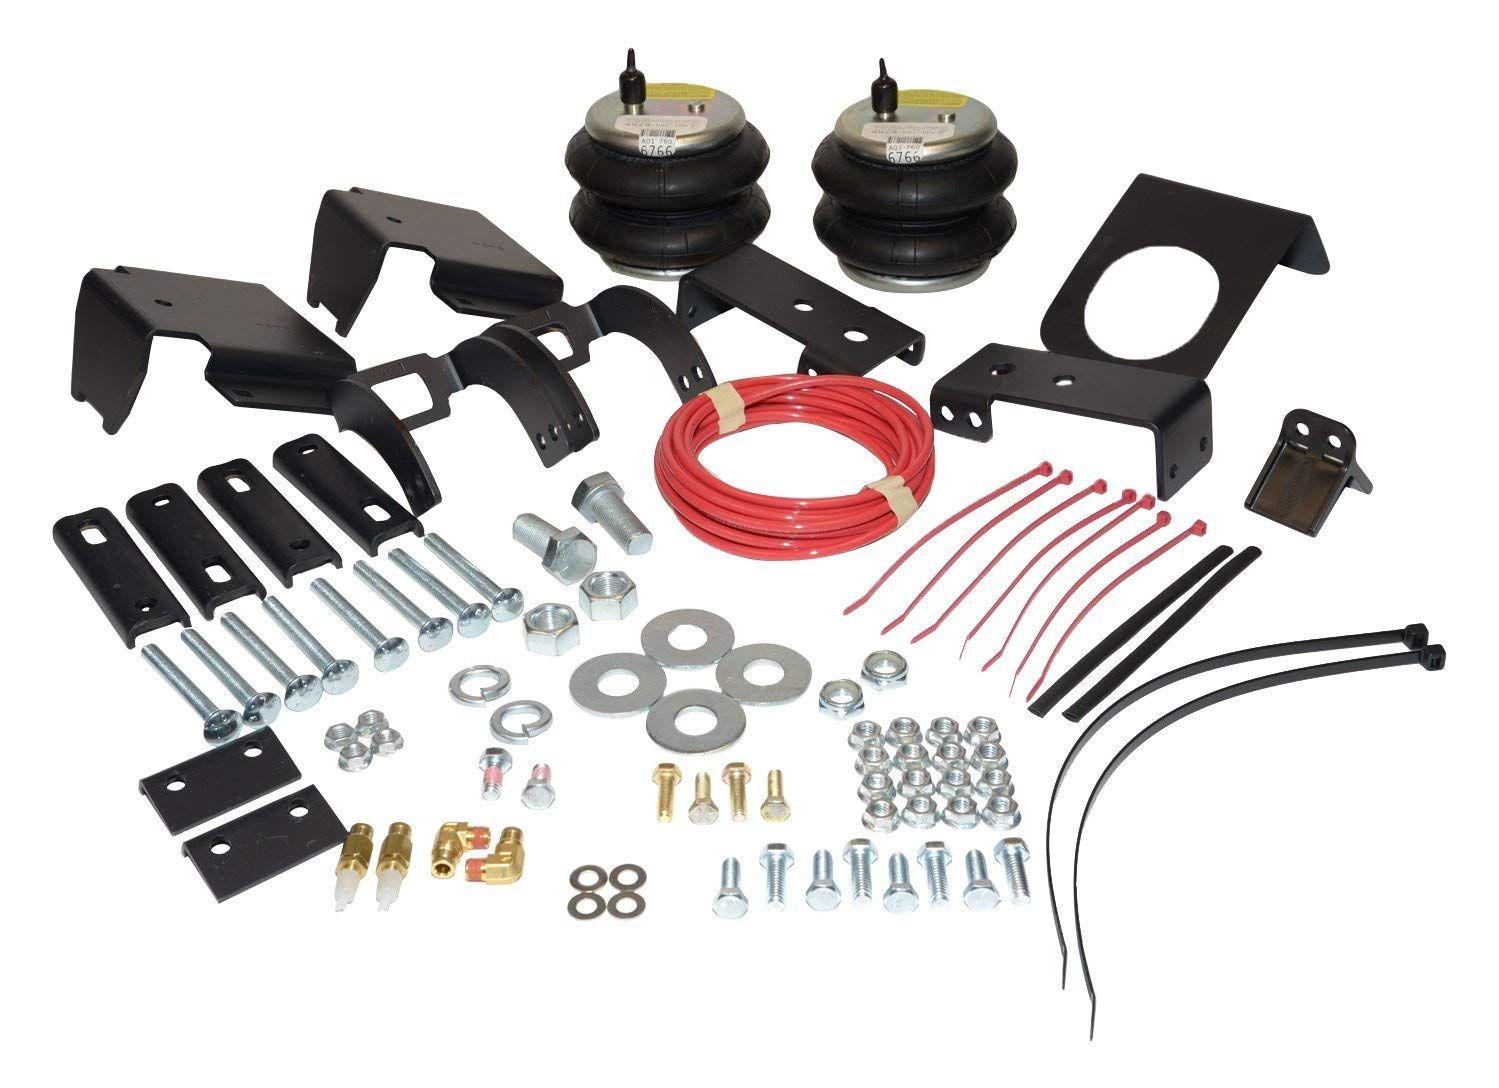 Firestone W217602407 RideRite Kit for Toyota 4WD